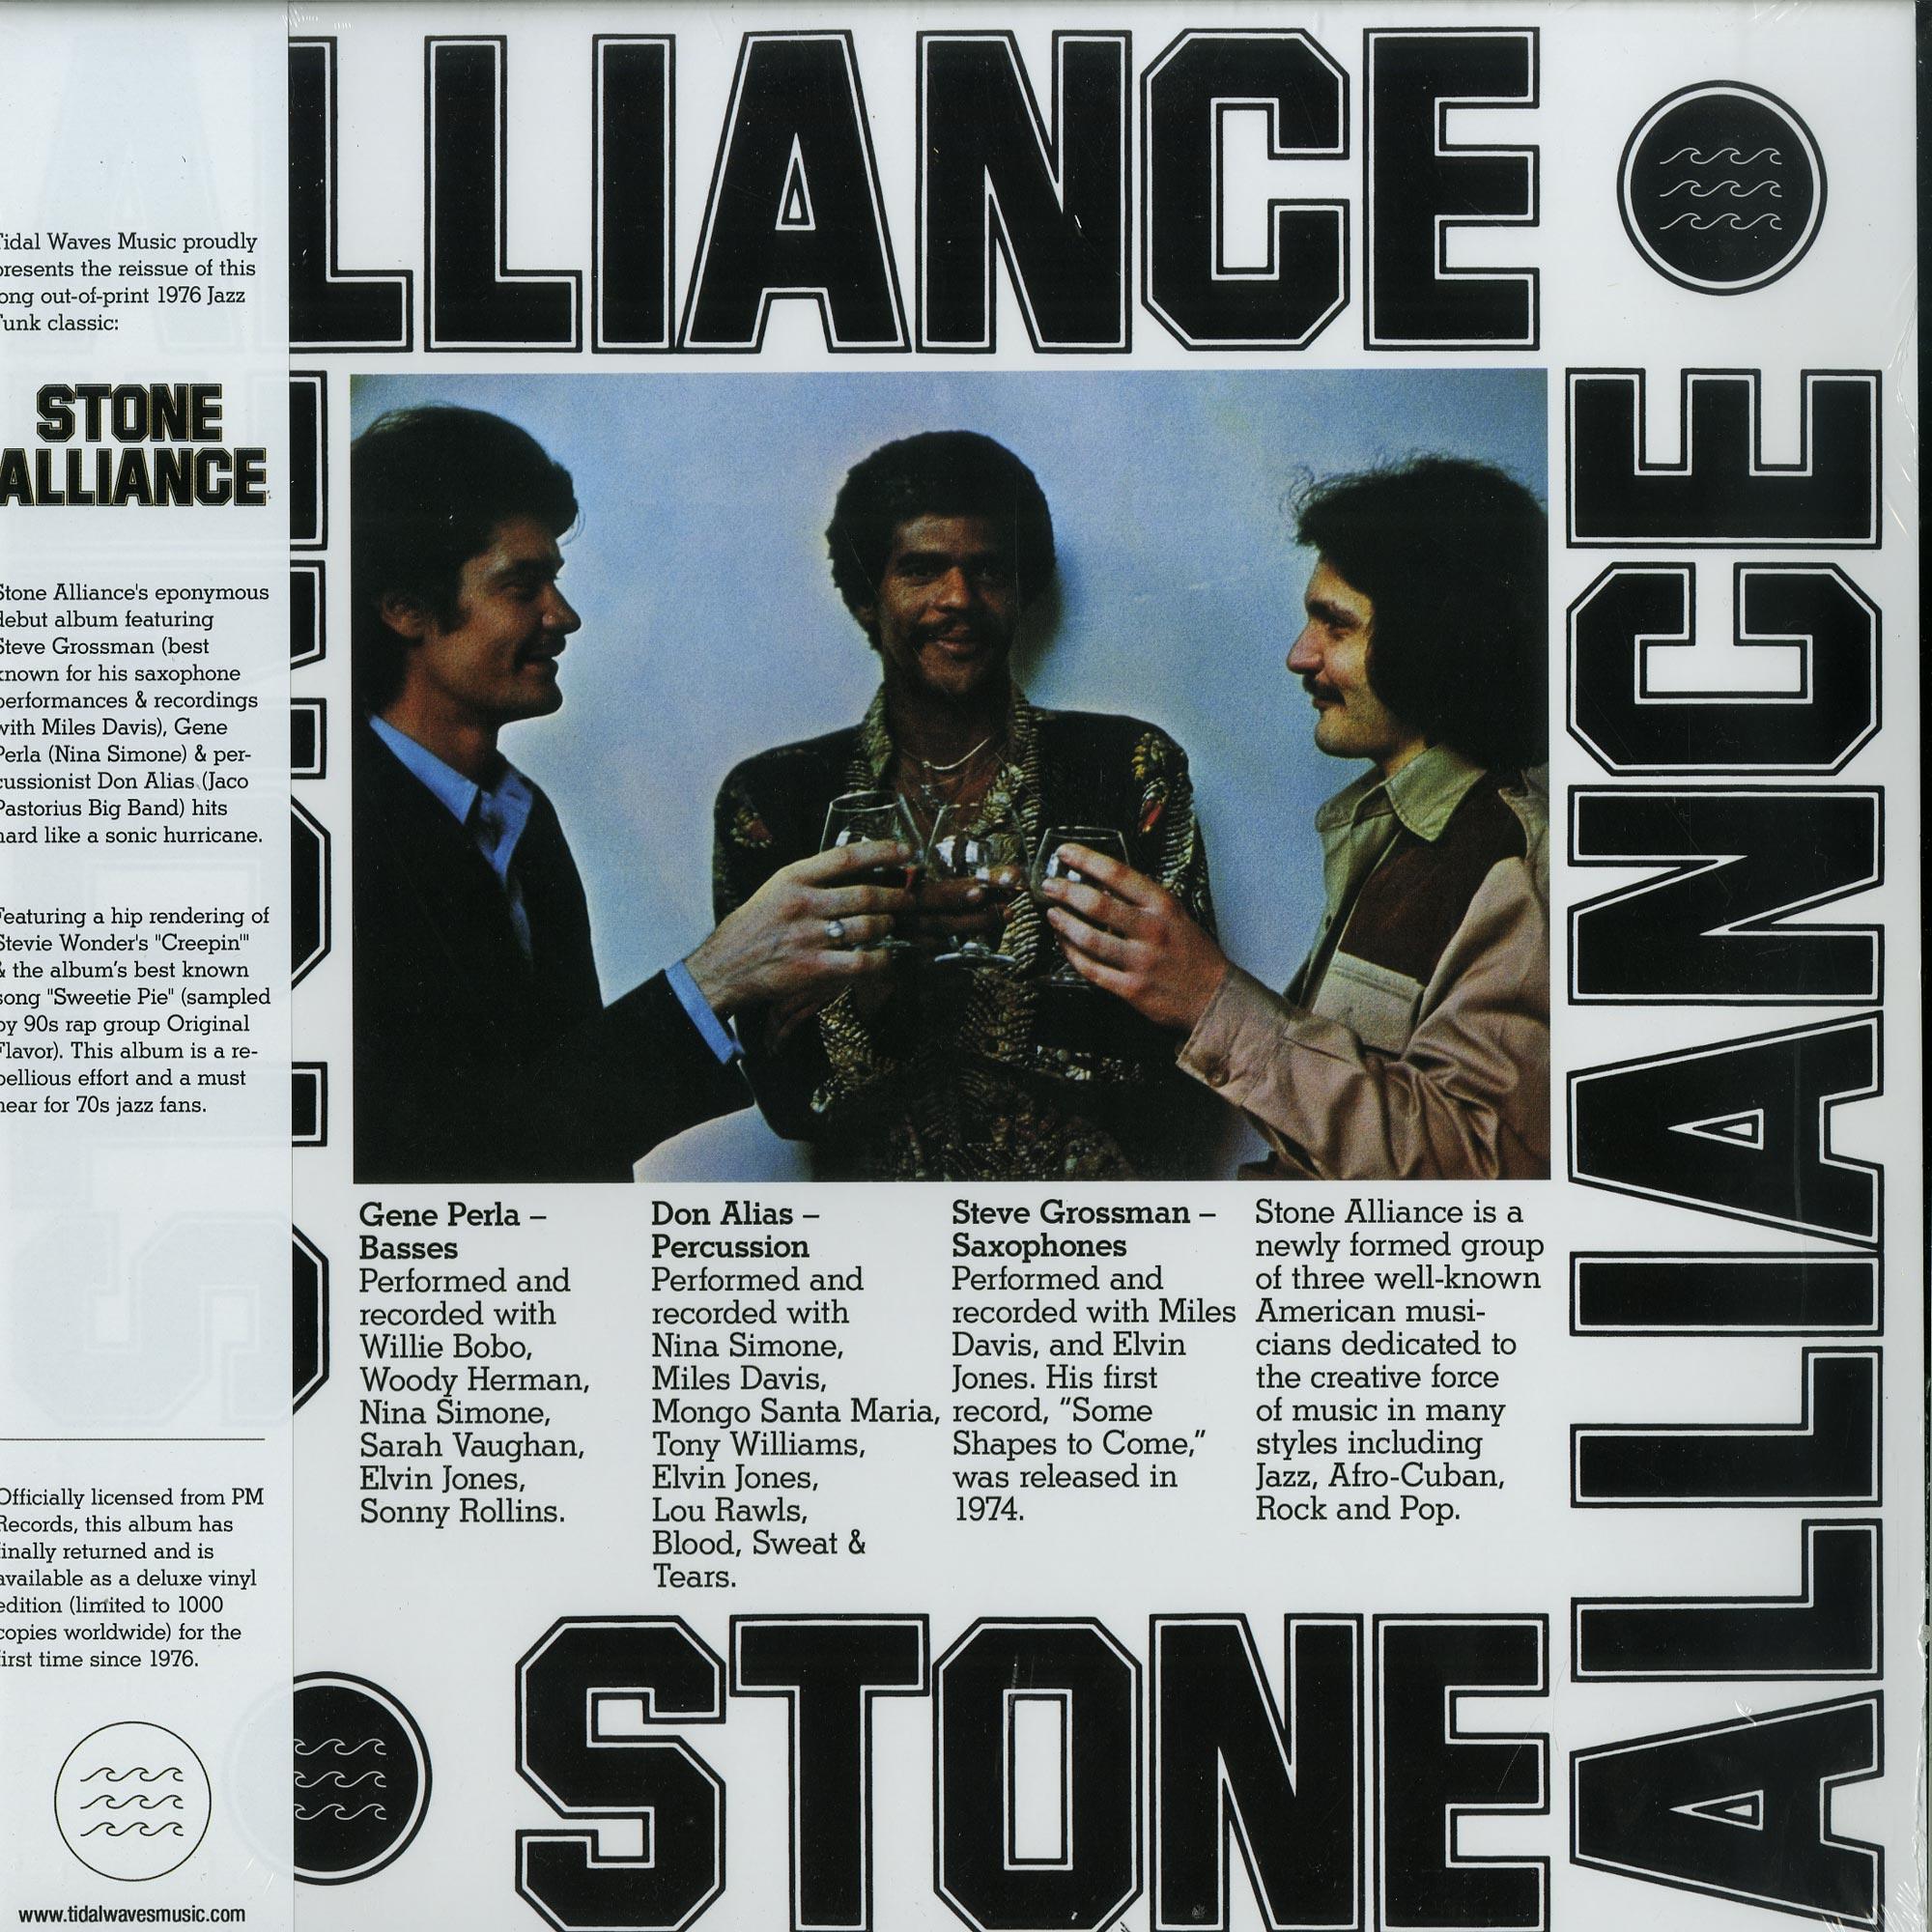 Stone Alliance - STONE ALLIANCE